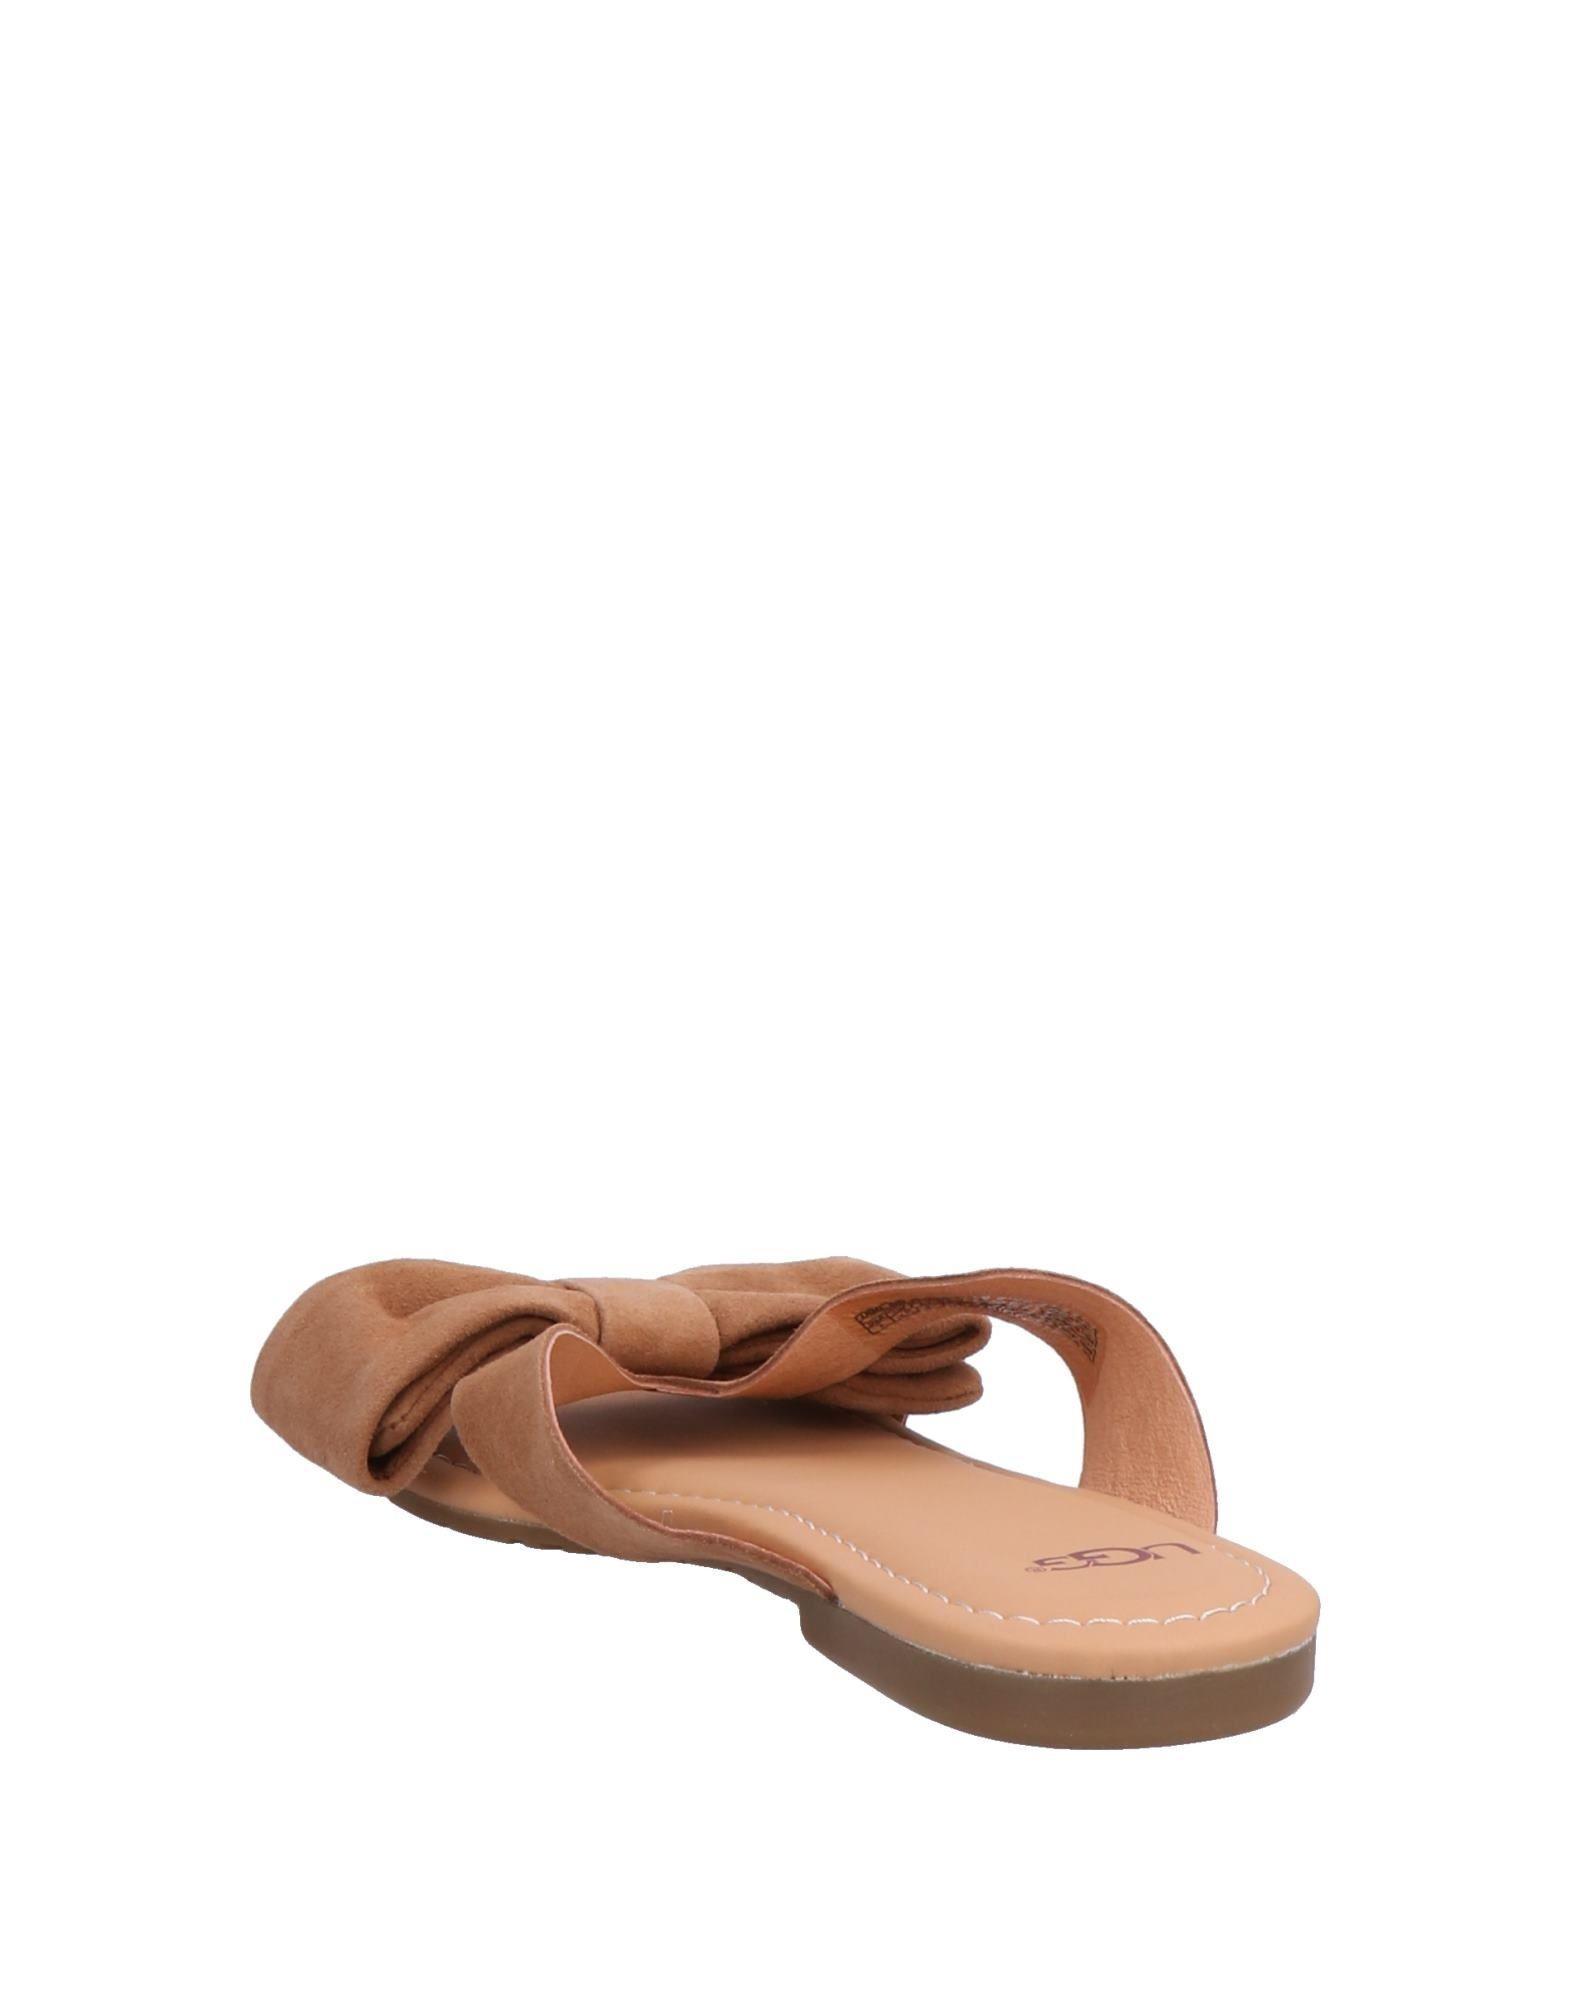 c614b2f8b94b UGG Sandals in Brown - Lyst